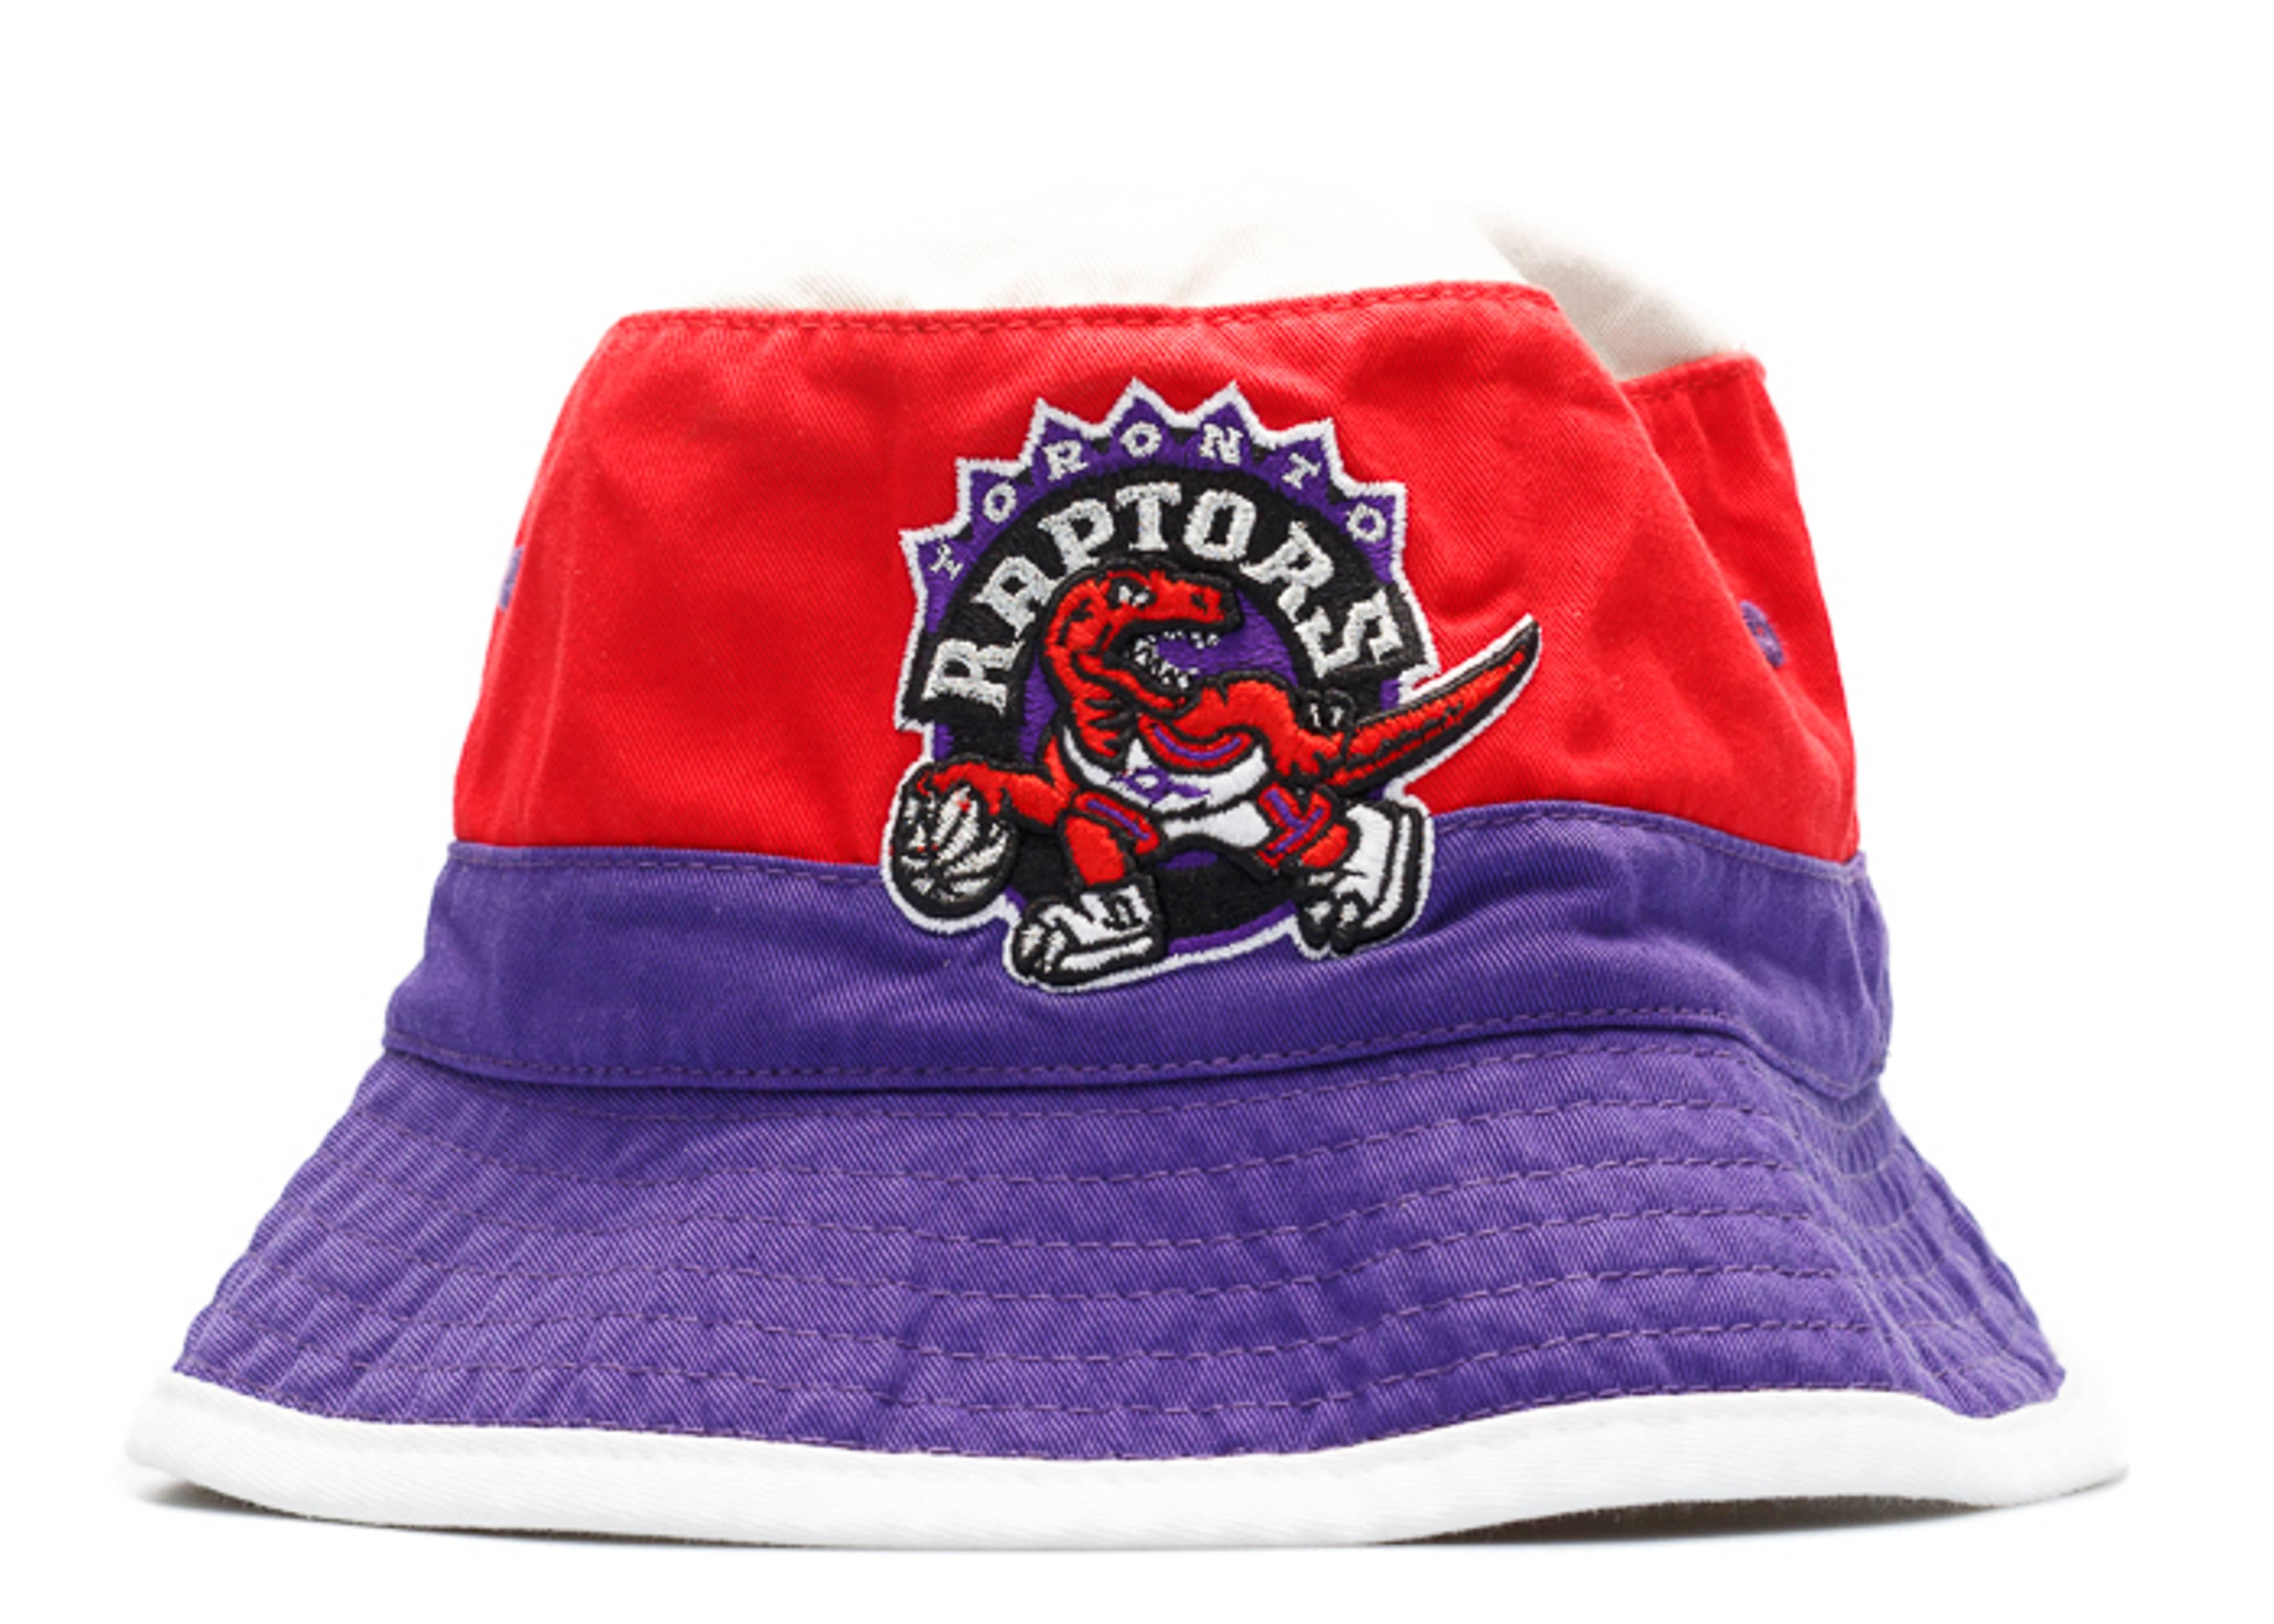 e1a64a7052331 Toronto Raptors Bucket Hat